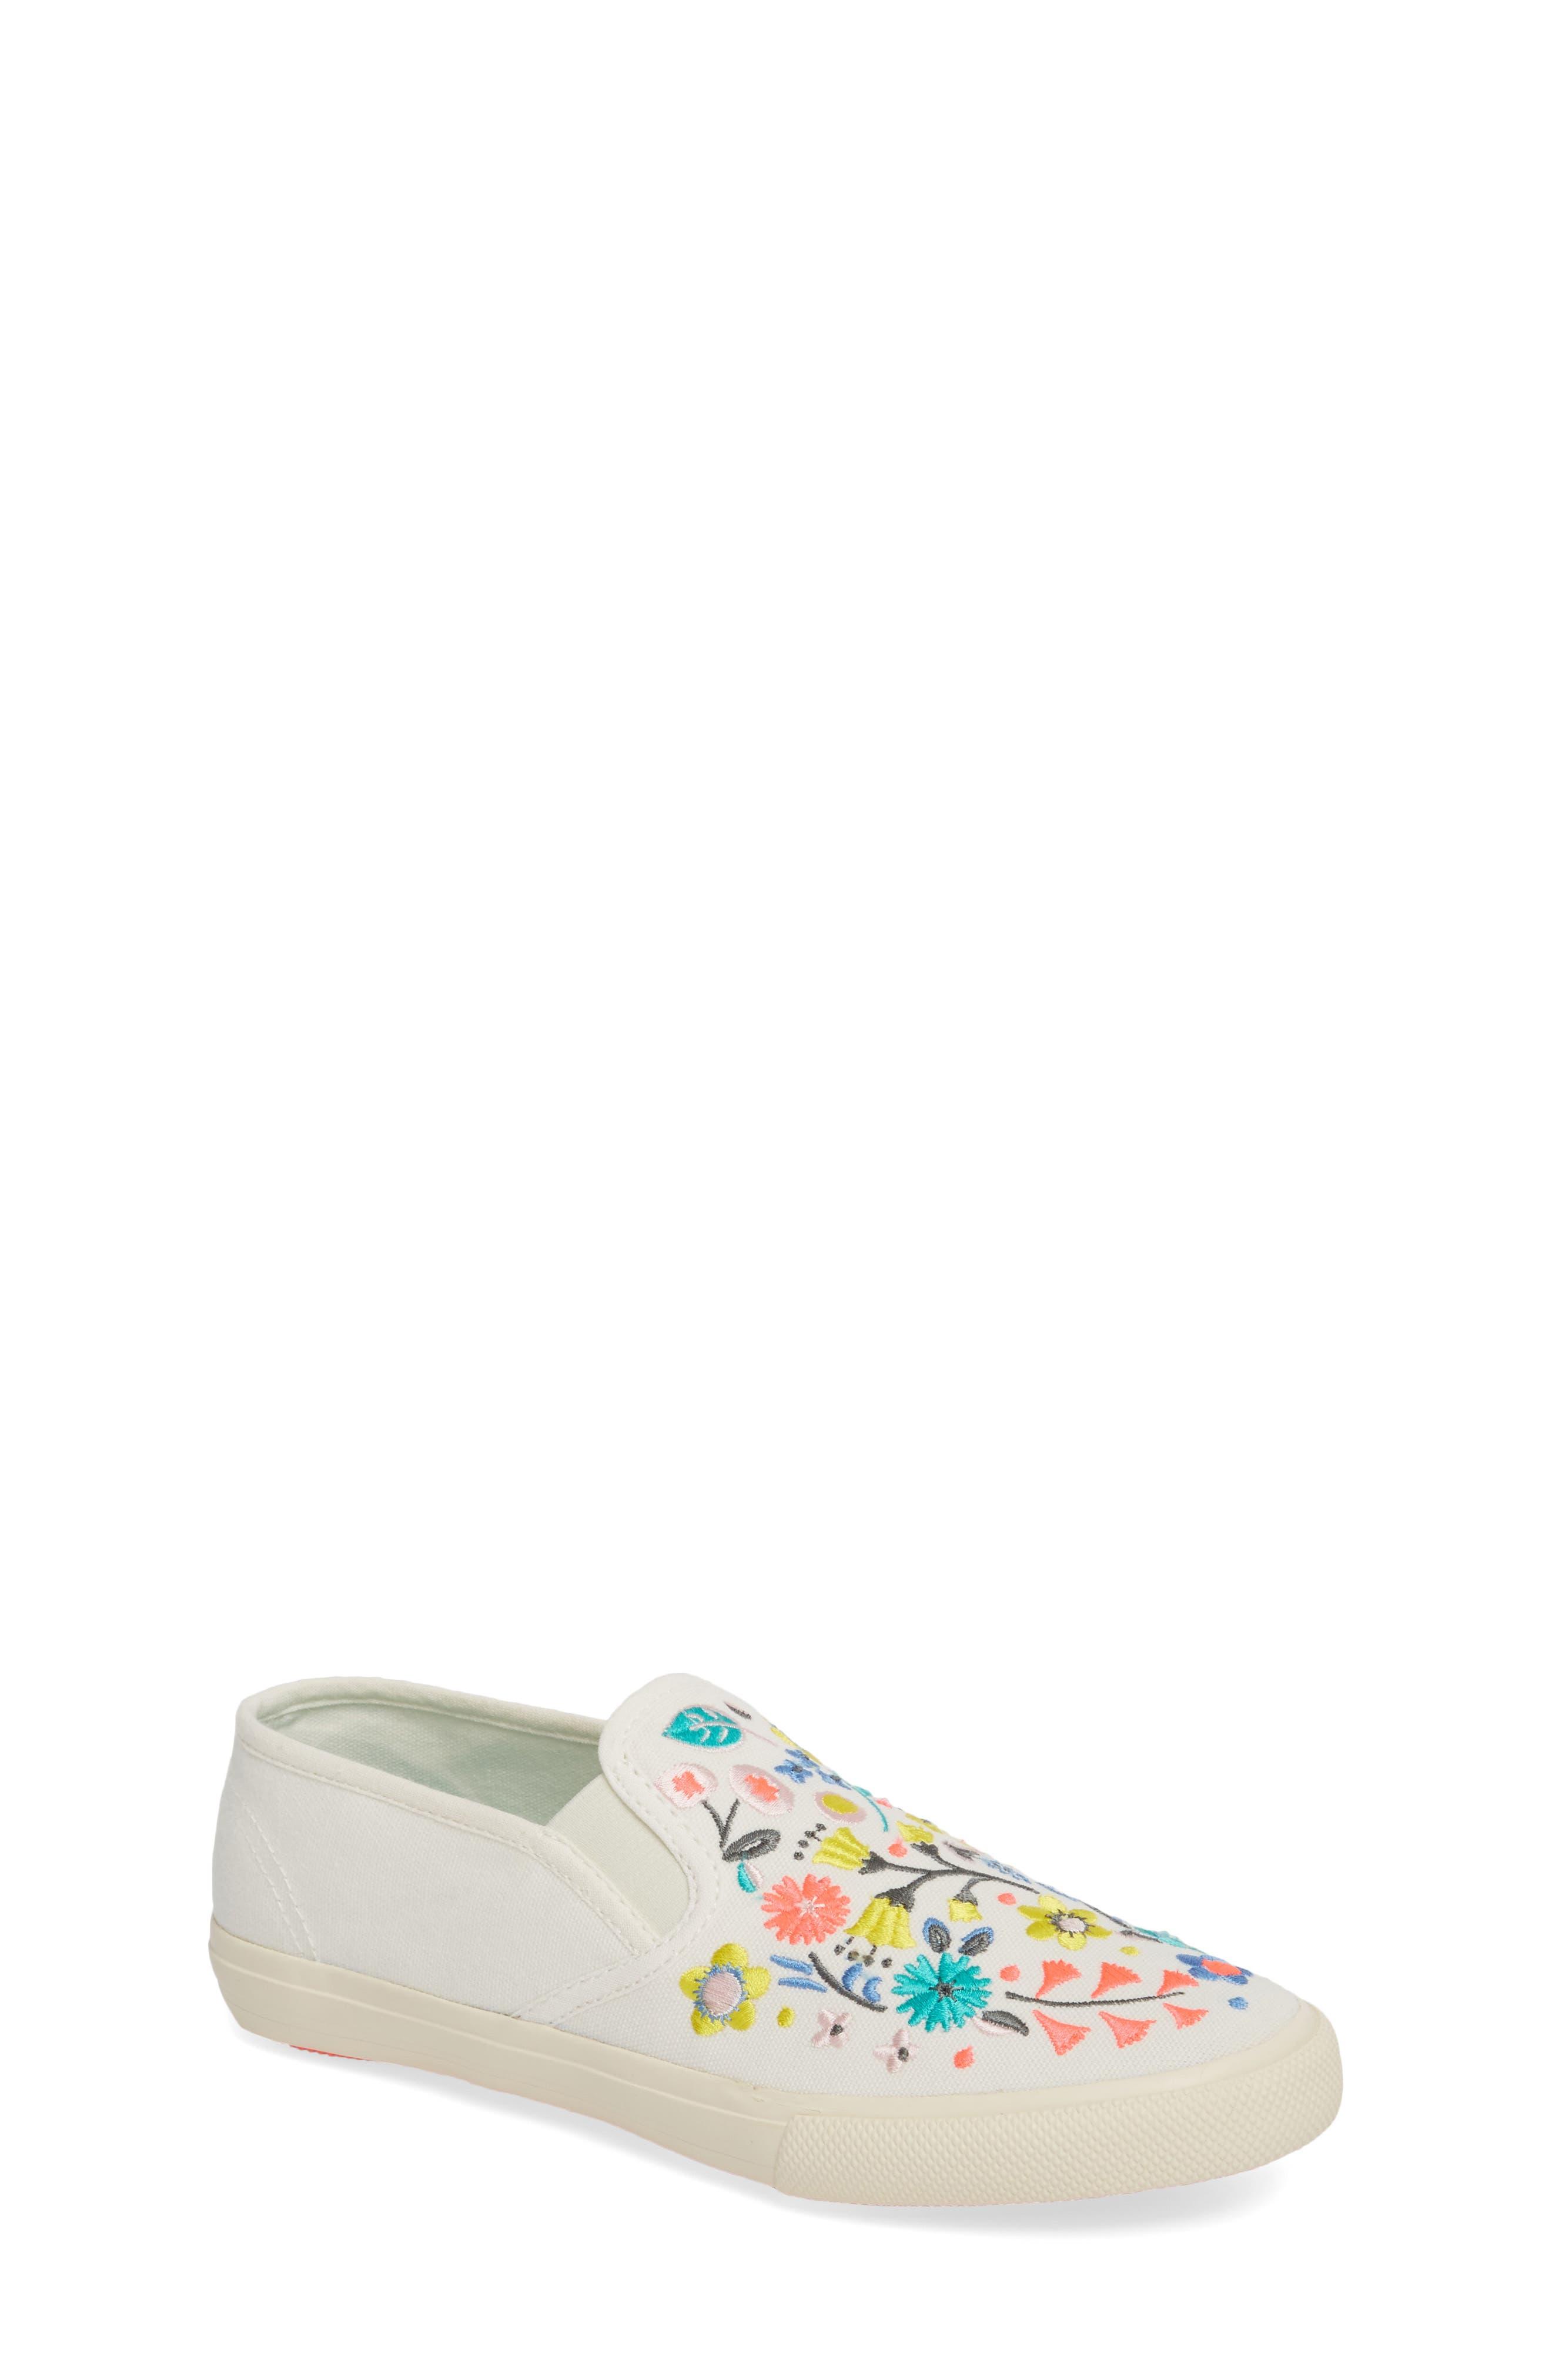 Boden Embroidered Slip-On Sneaker,                         Main,                         color, Ecru